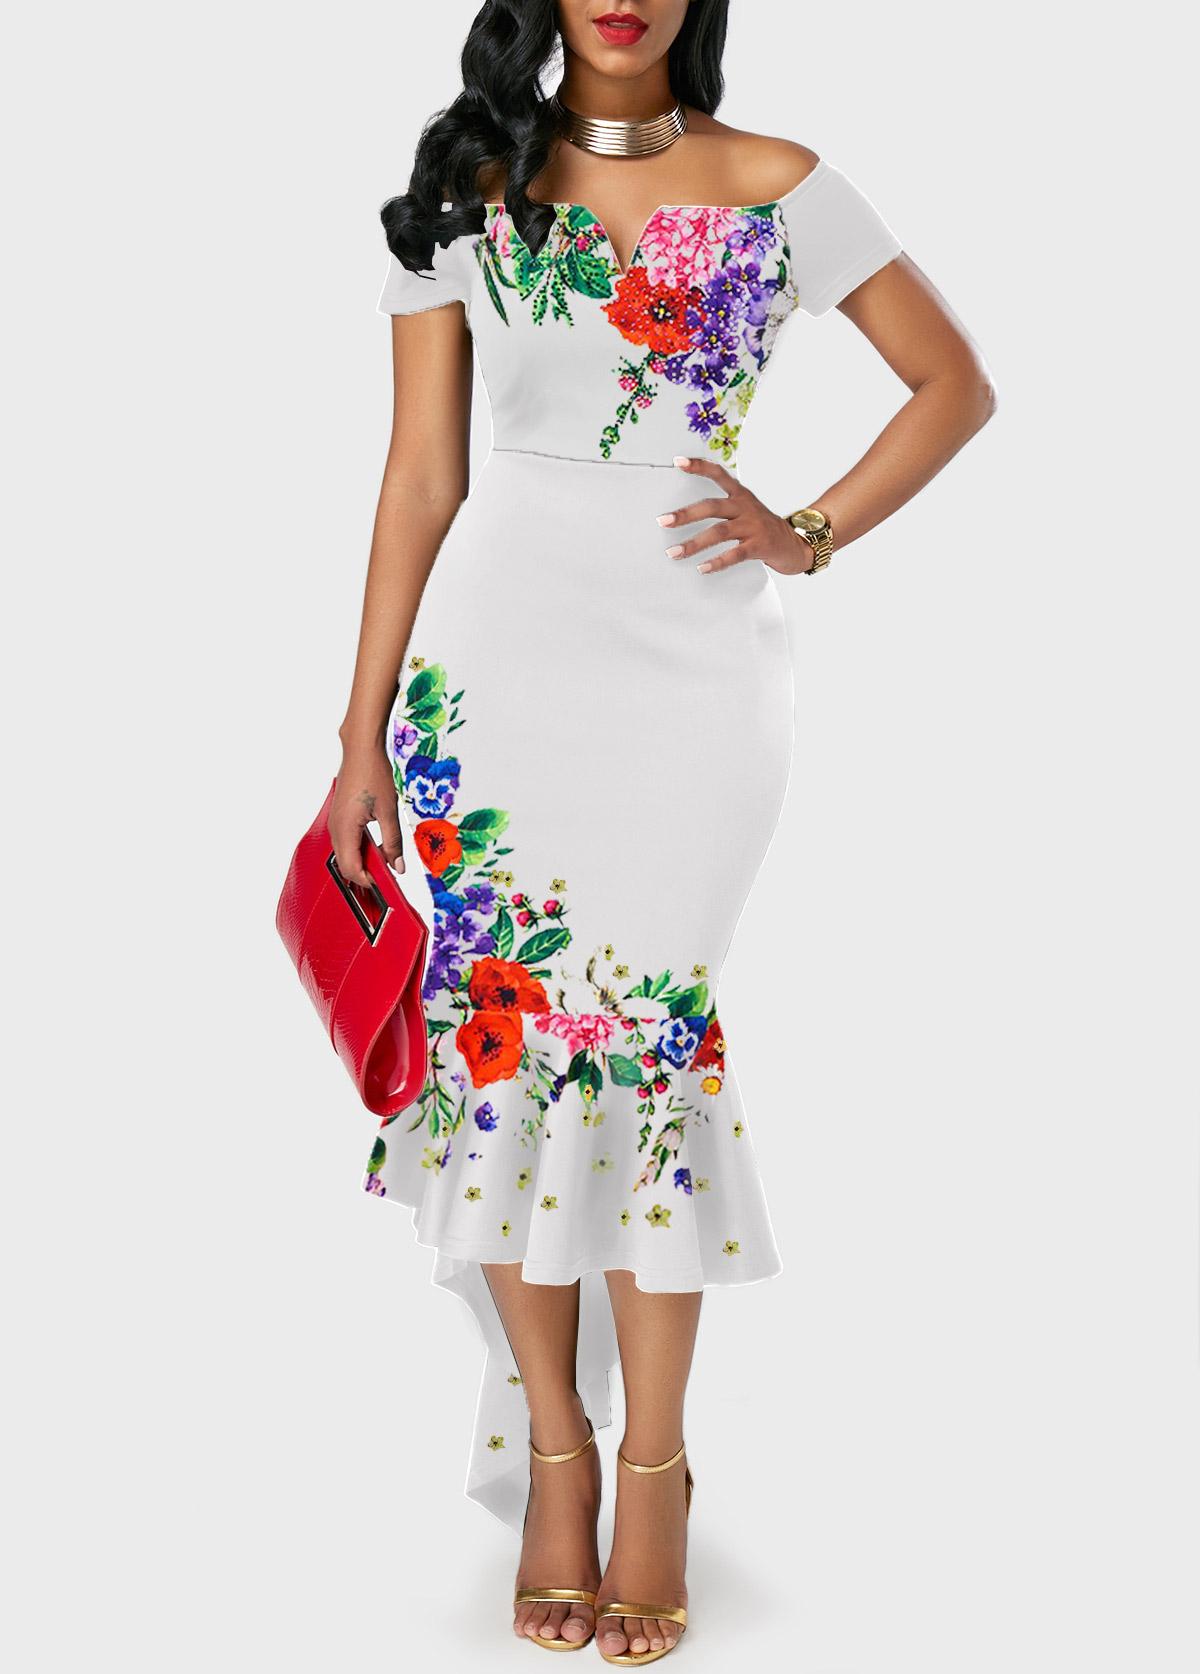 Ruffle Hem Flower Print White Off the Shoulder Dress